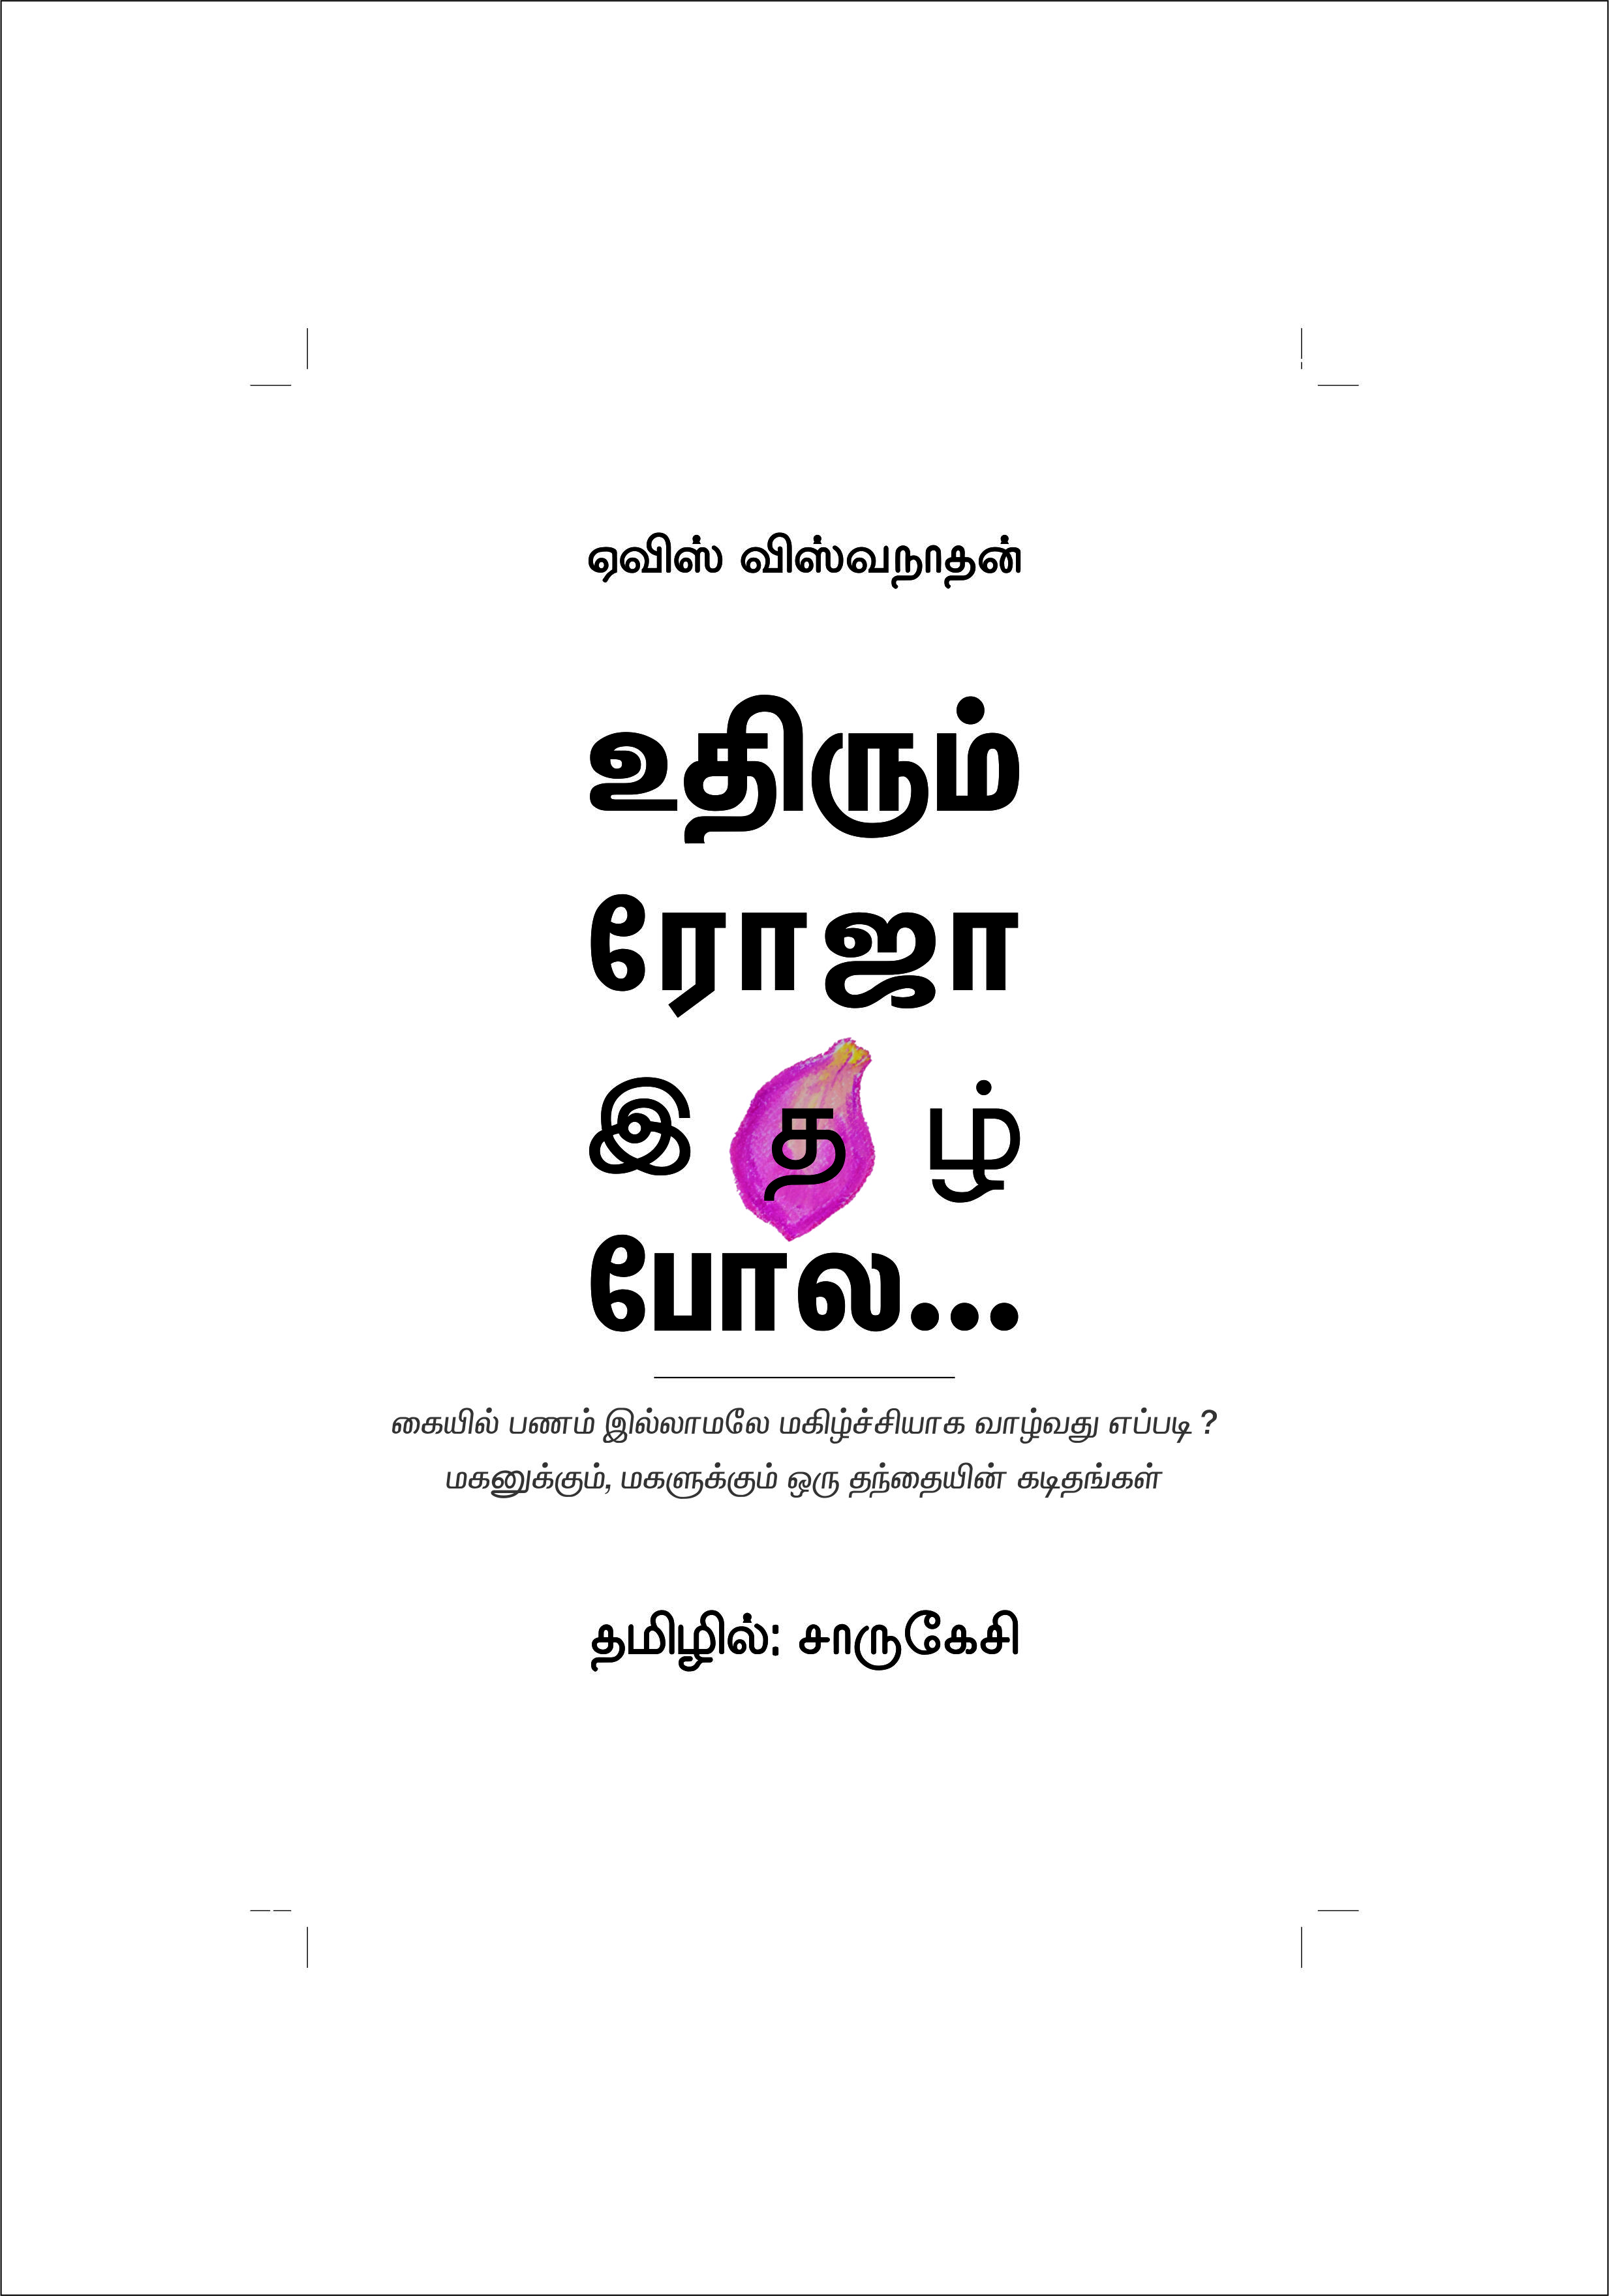 AVIS-Viswanathan-Fall-Like-A-Rose-Petal-Tamil